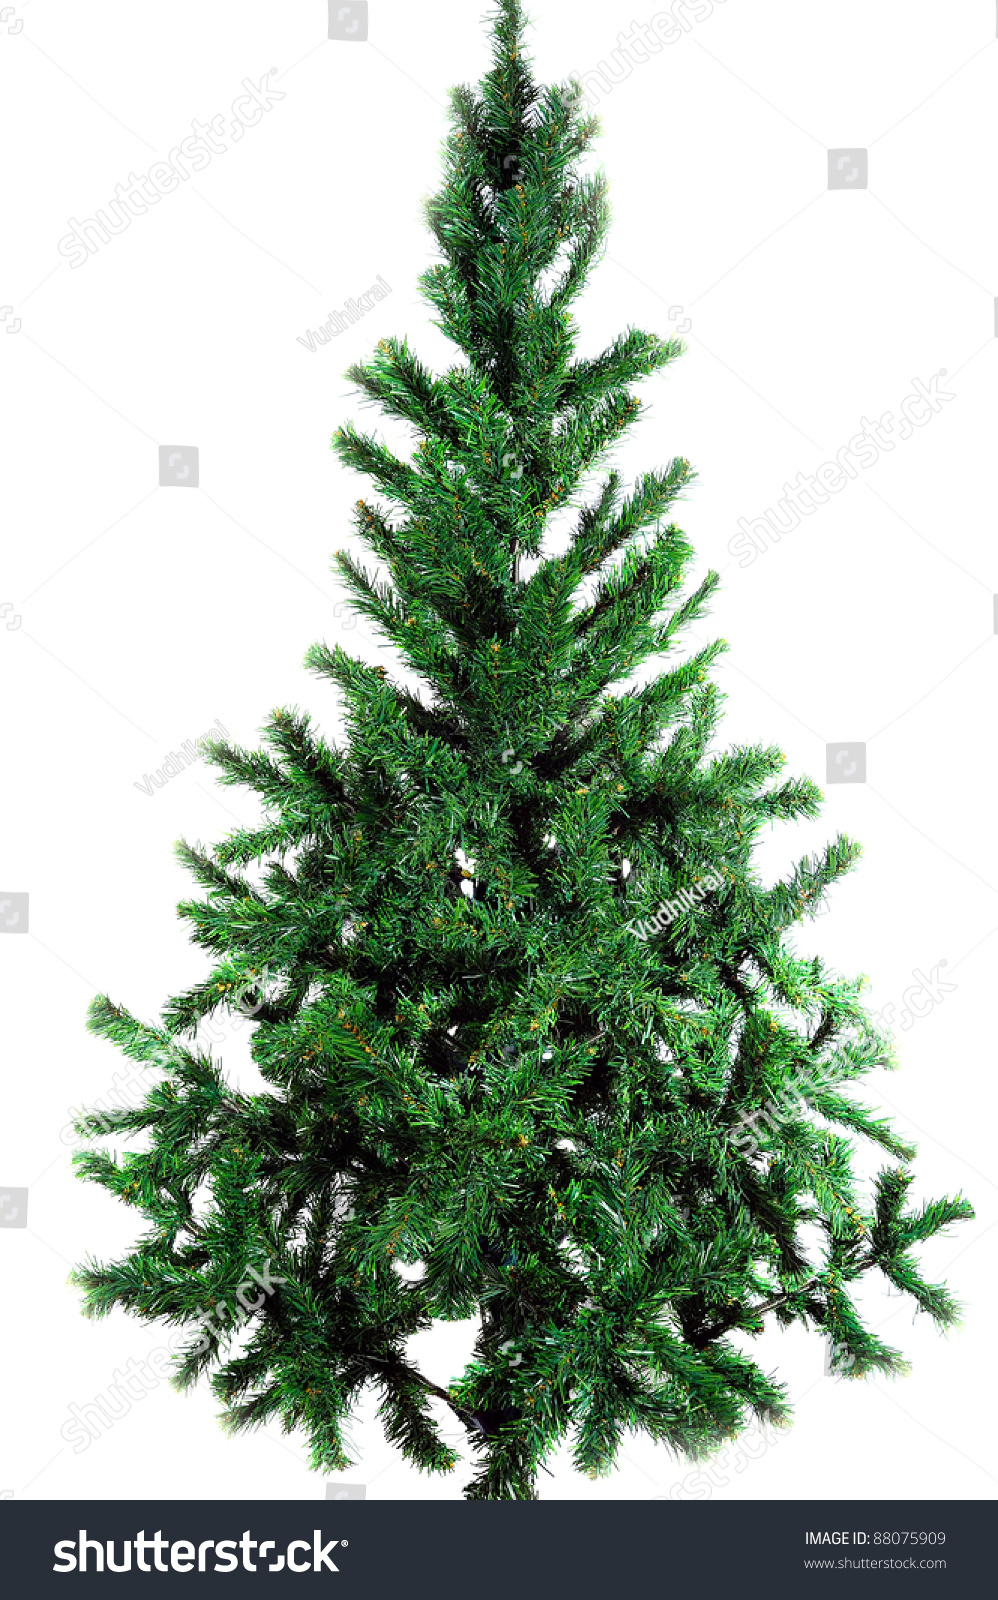 Plain Christmas Tree Stock Photo 88075909 - Shutterstock